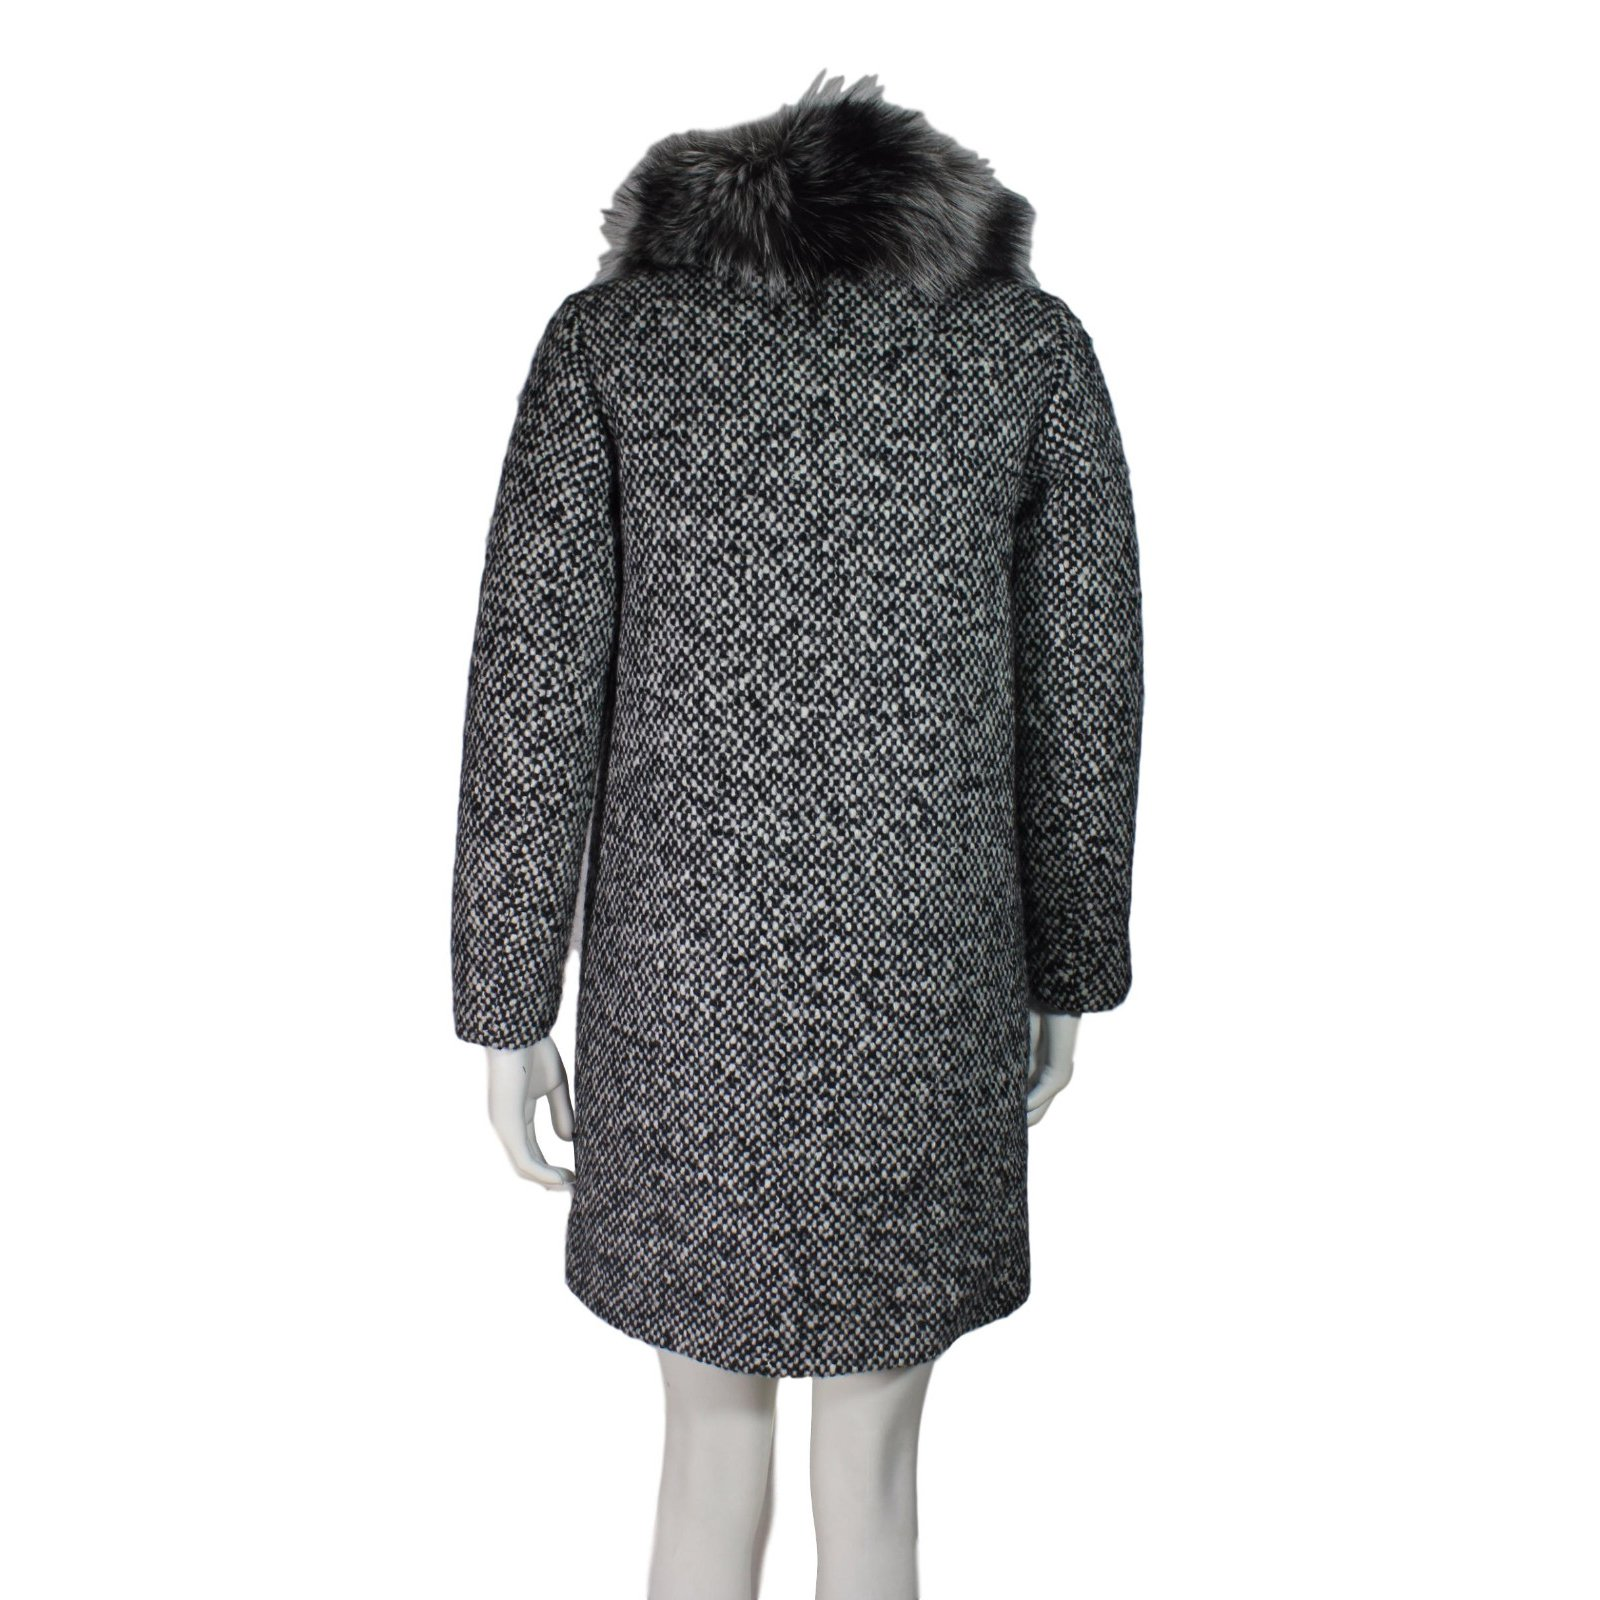 3ad8e2612 Moncler Loth tweed coat